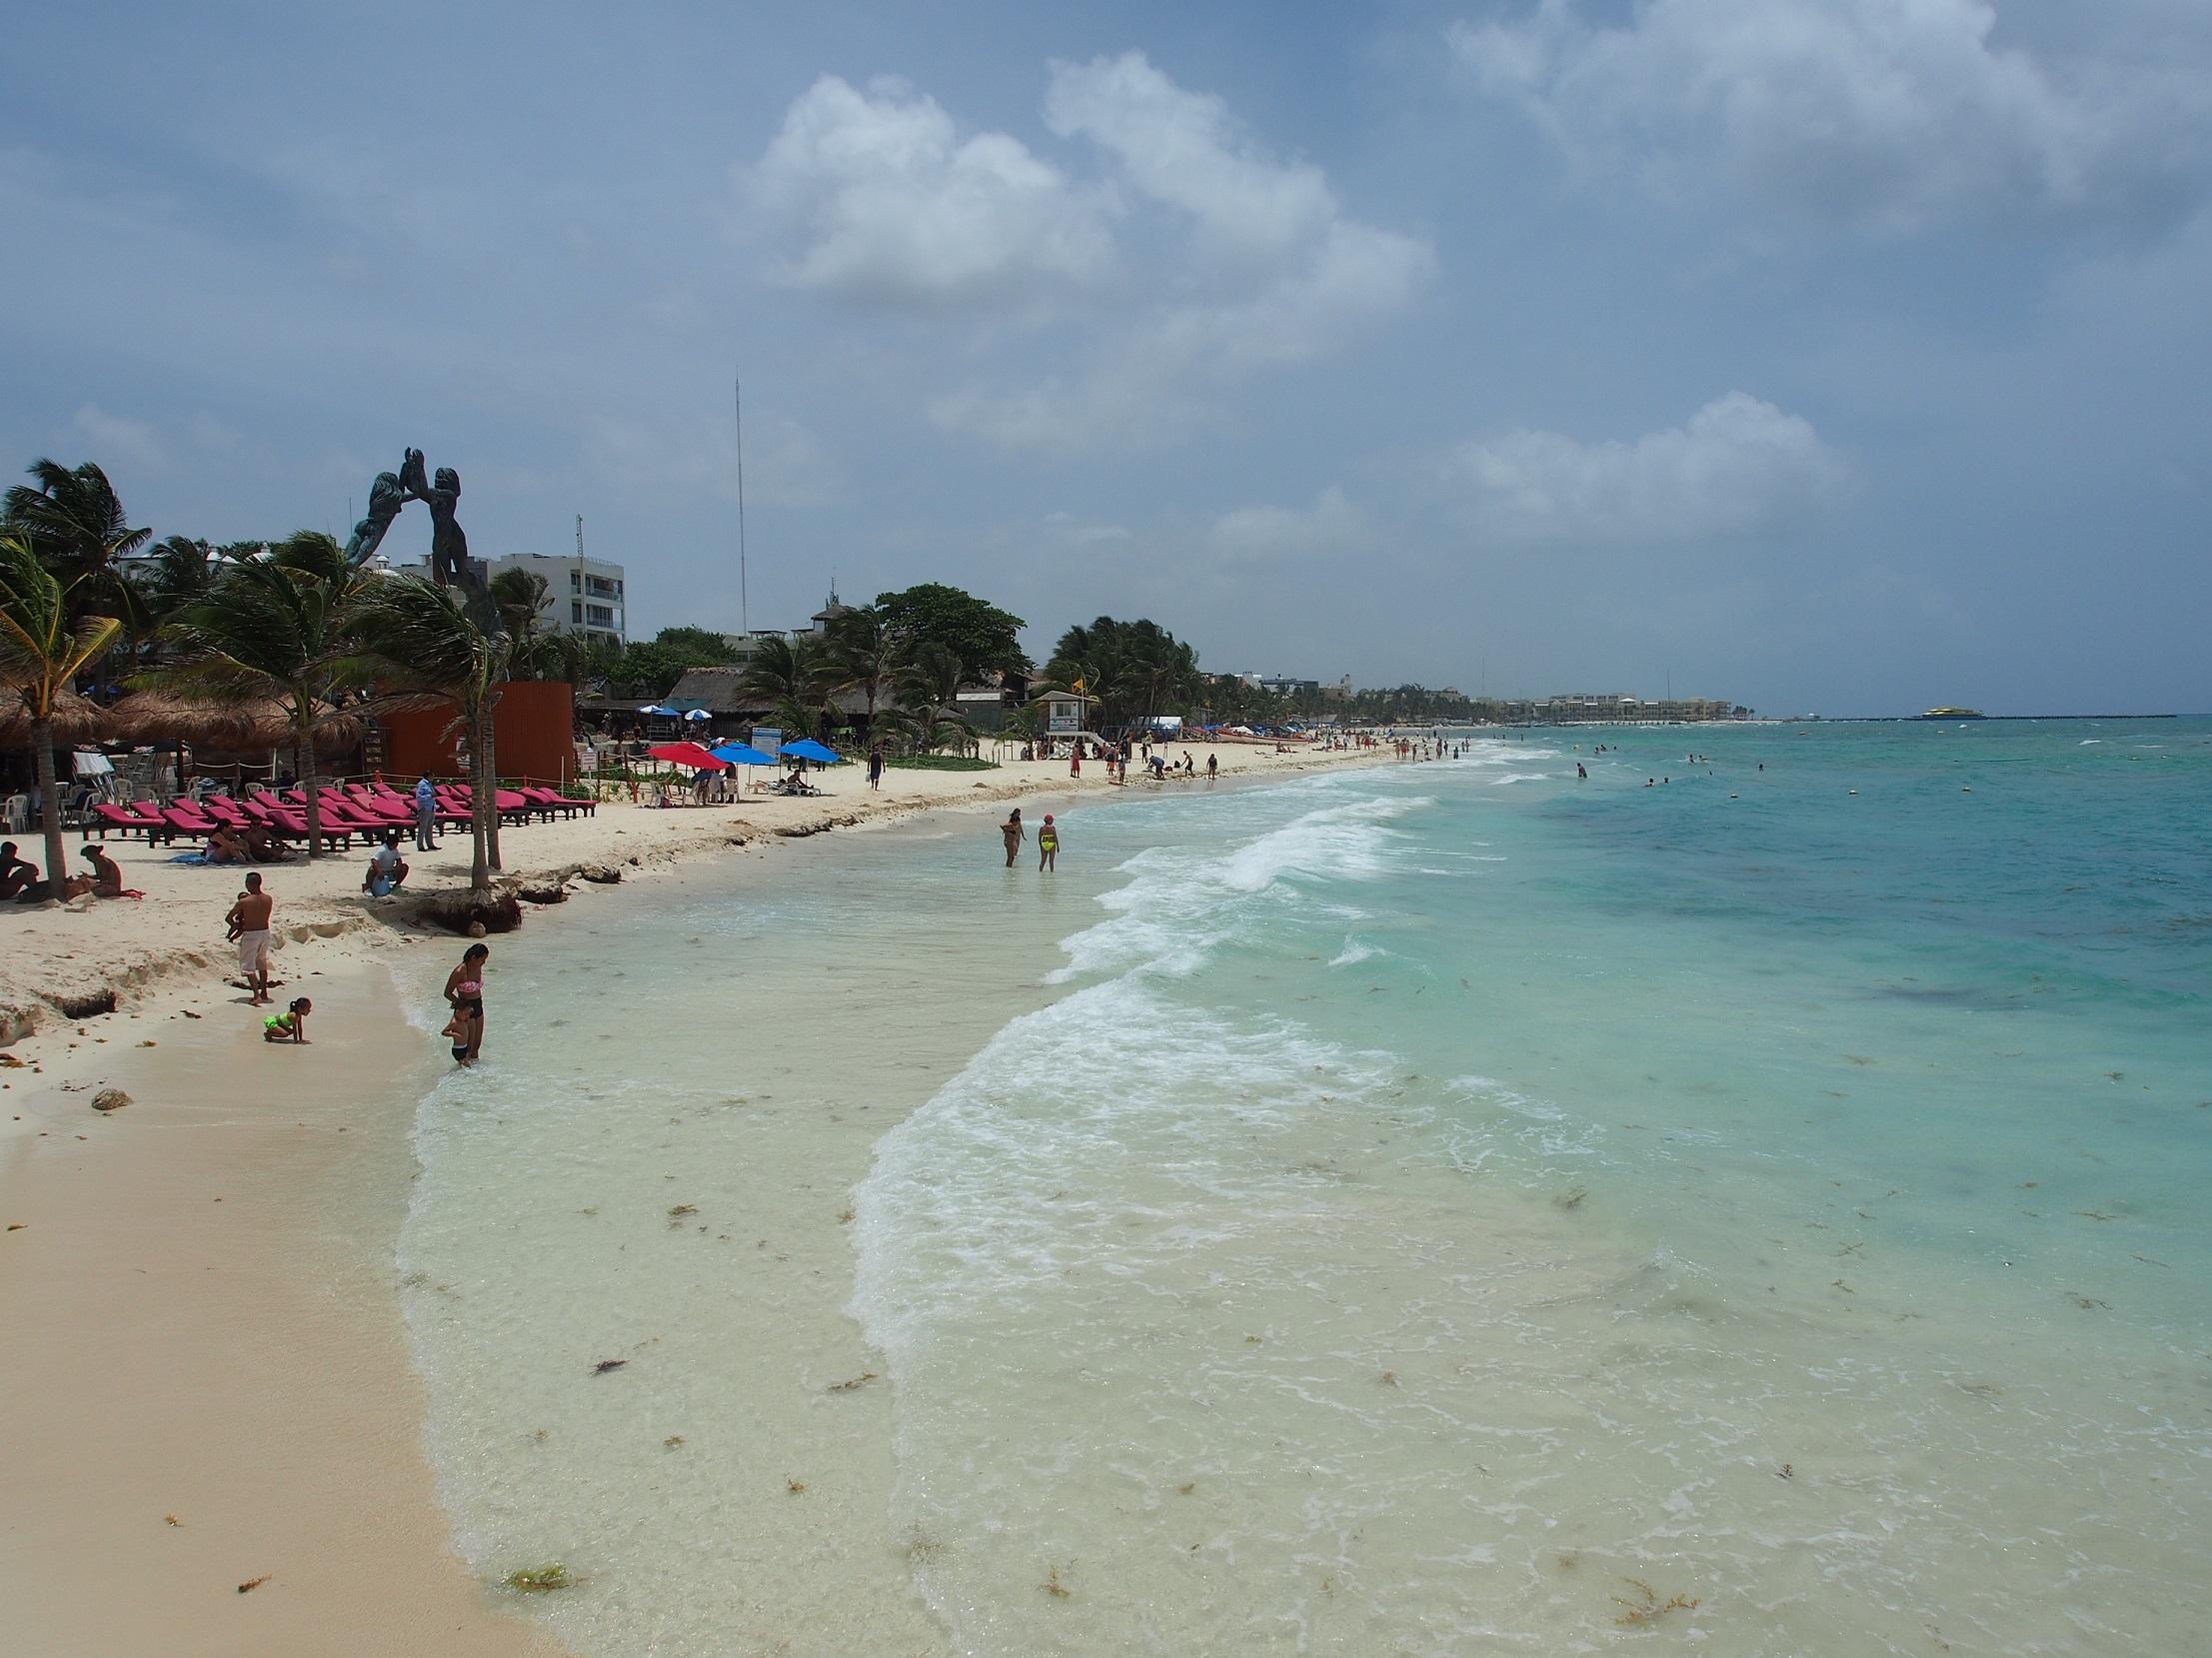 playa-del-carmen-mexico-girl-in-chief-blog